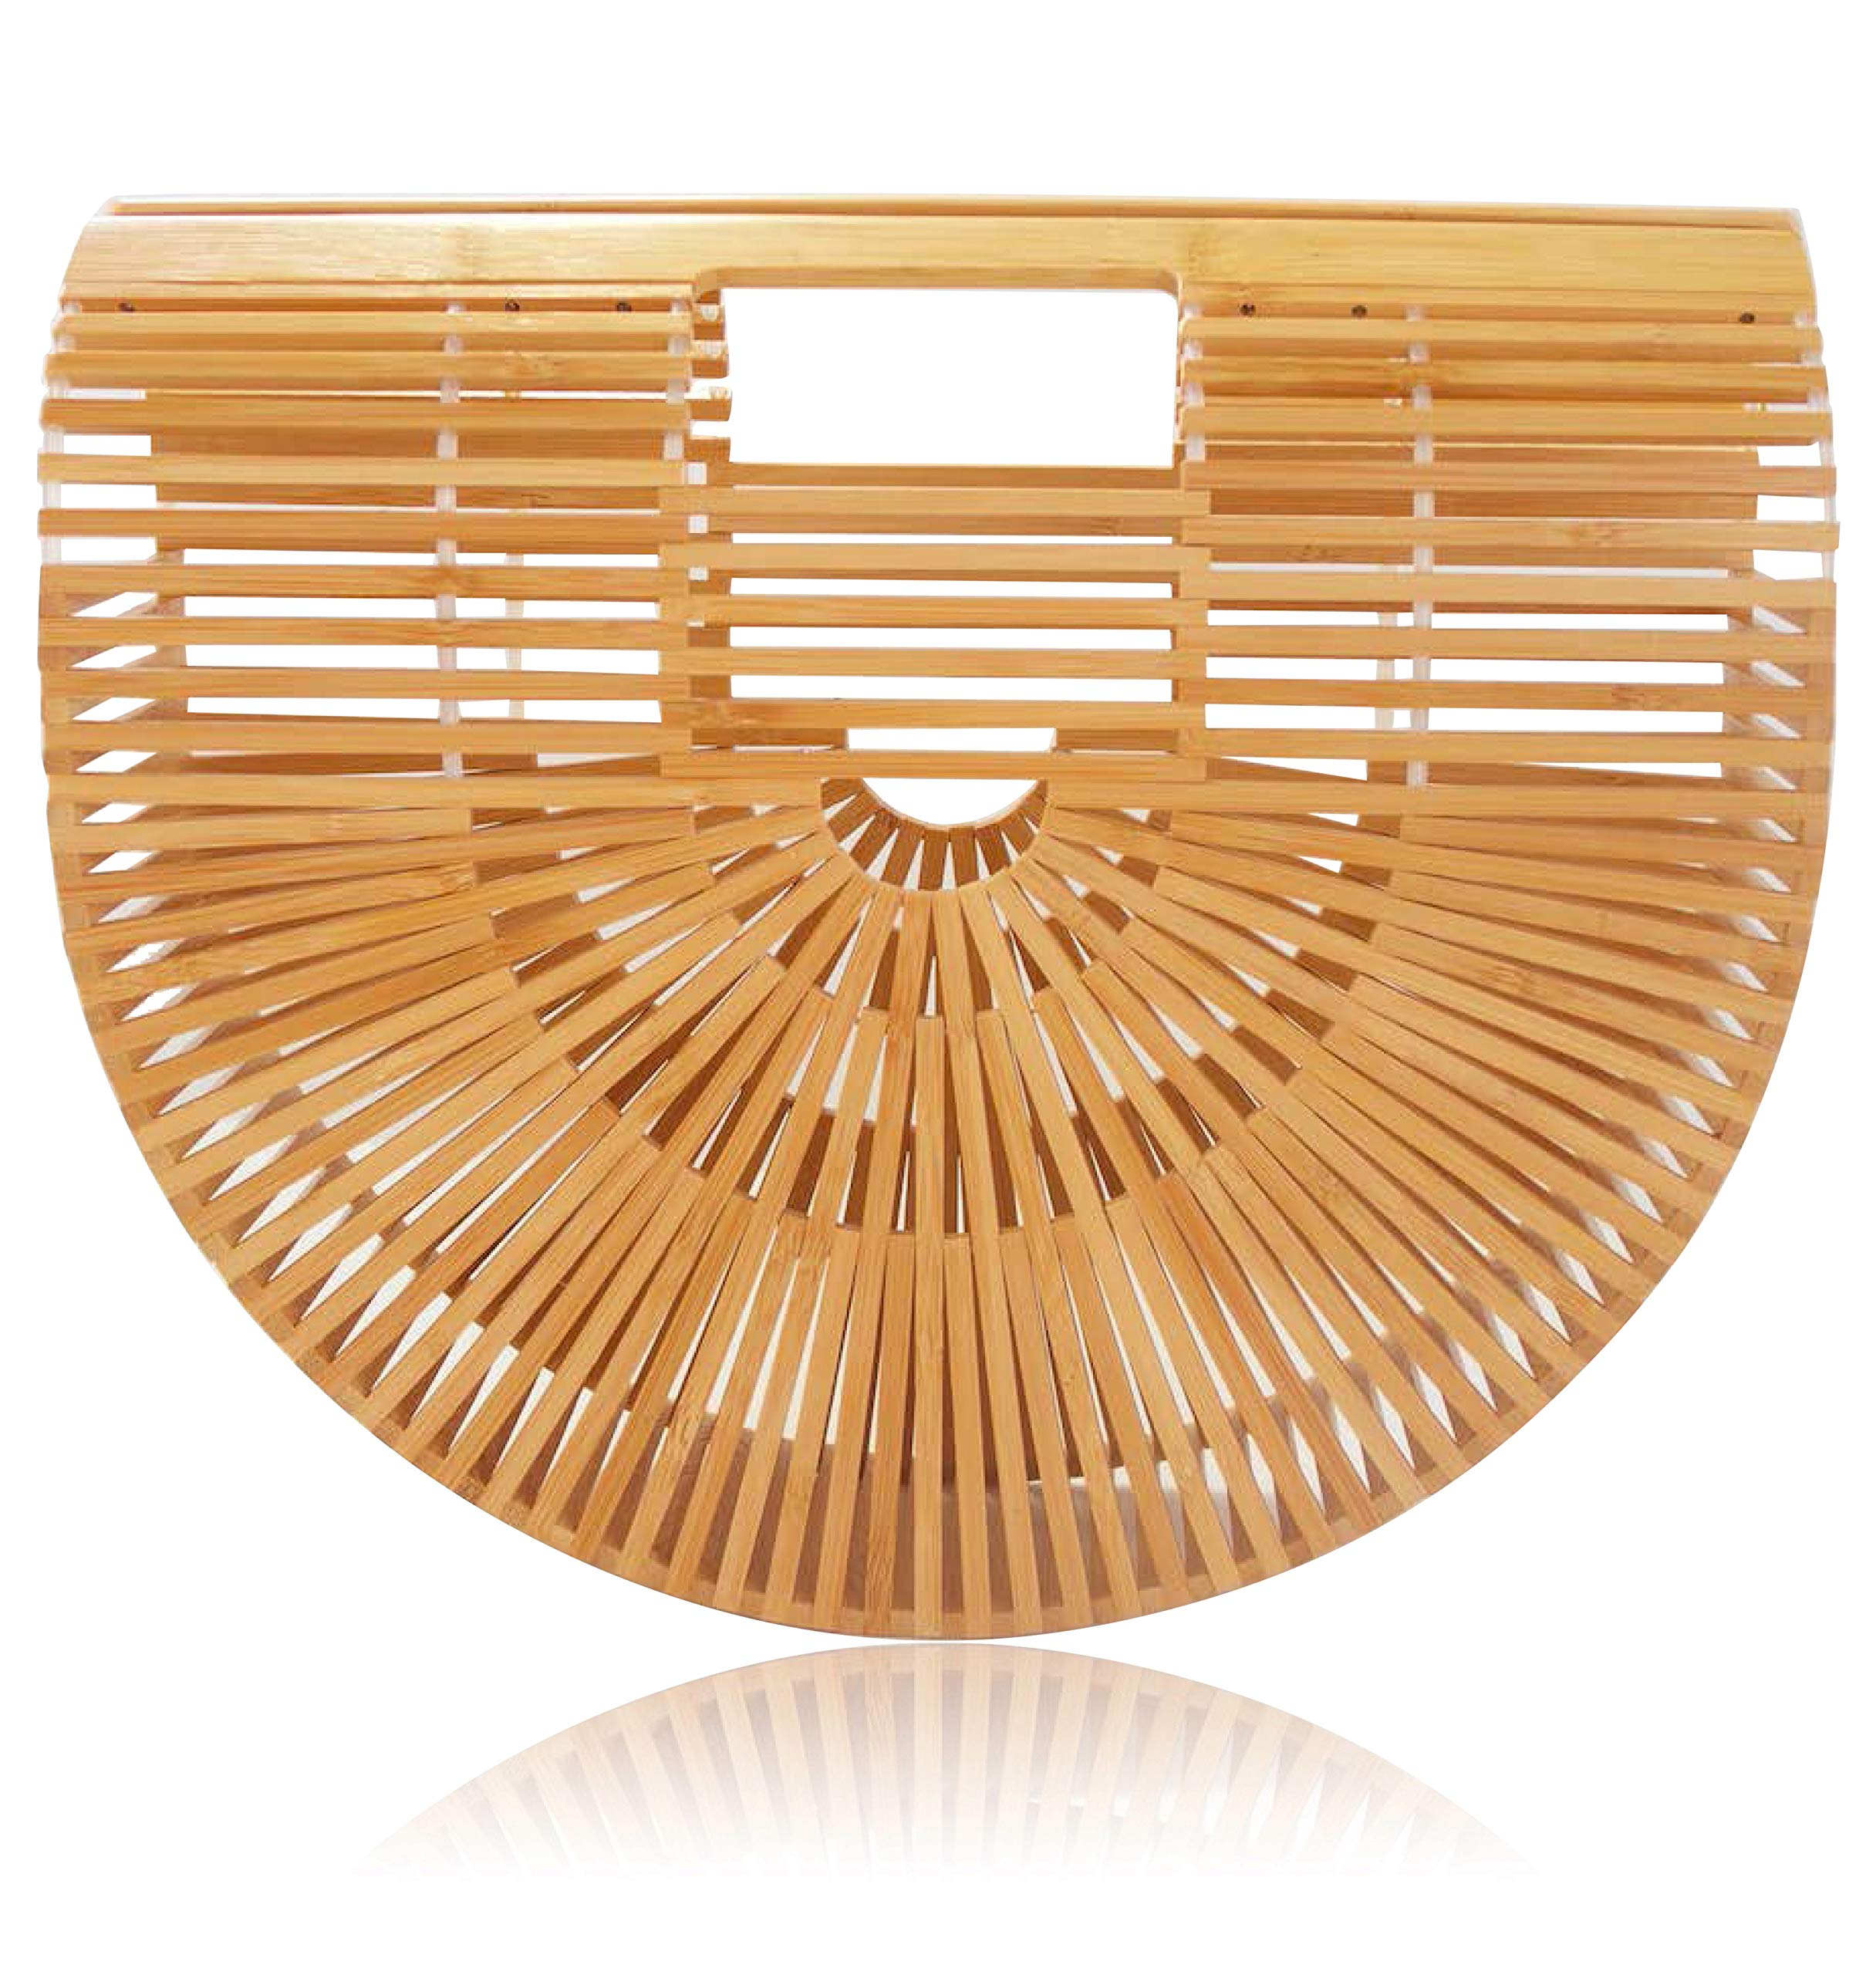 New 2018 Bamboo Handbag and Purse Handmade Beach Tote for Women by la Bambu (Small 11.25 x 3 x 9.5, Natural)